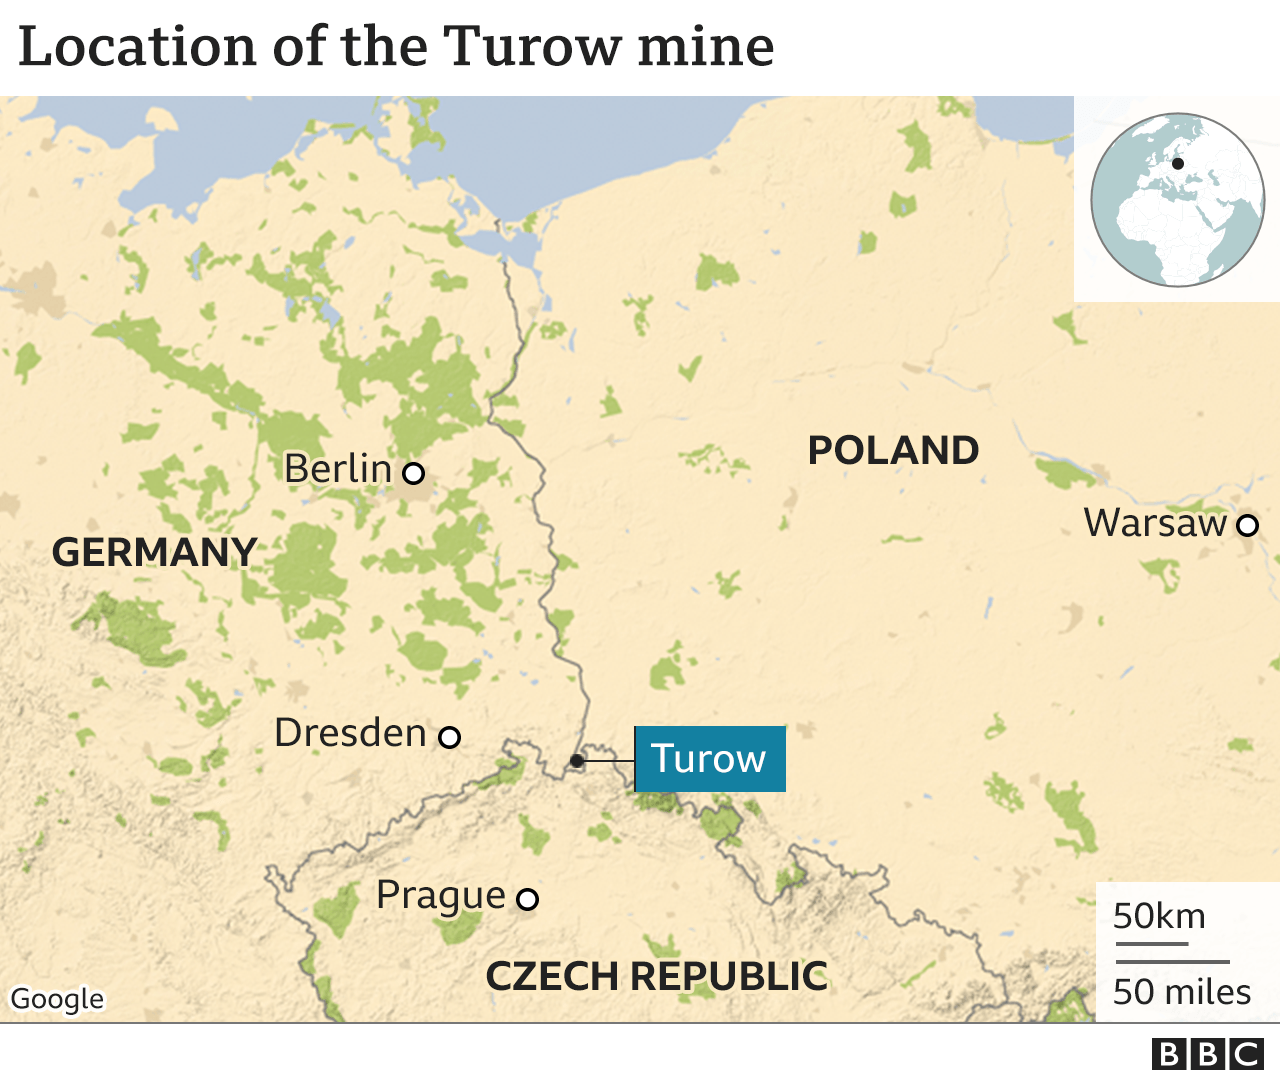 Turow mine location